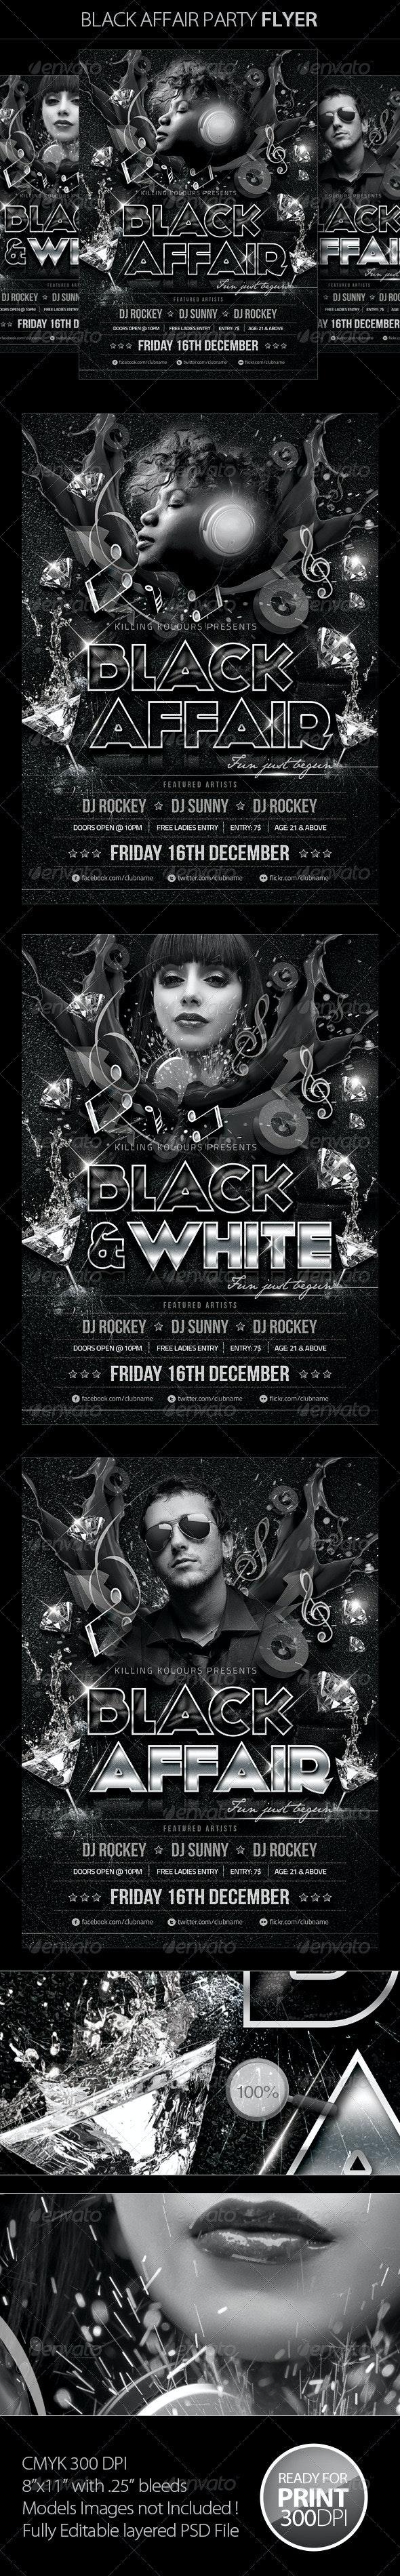 Black Affair Party Flyer - Clubs & Parties Events